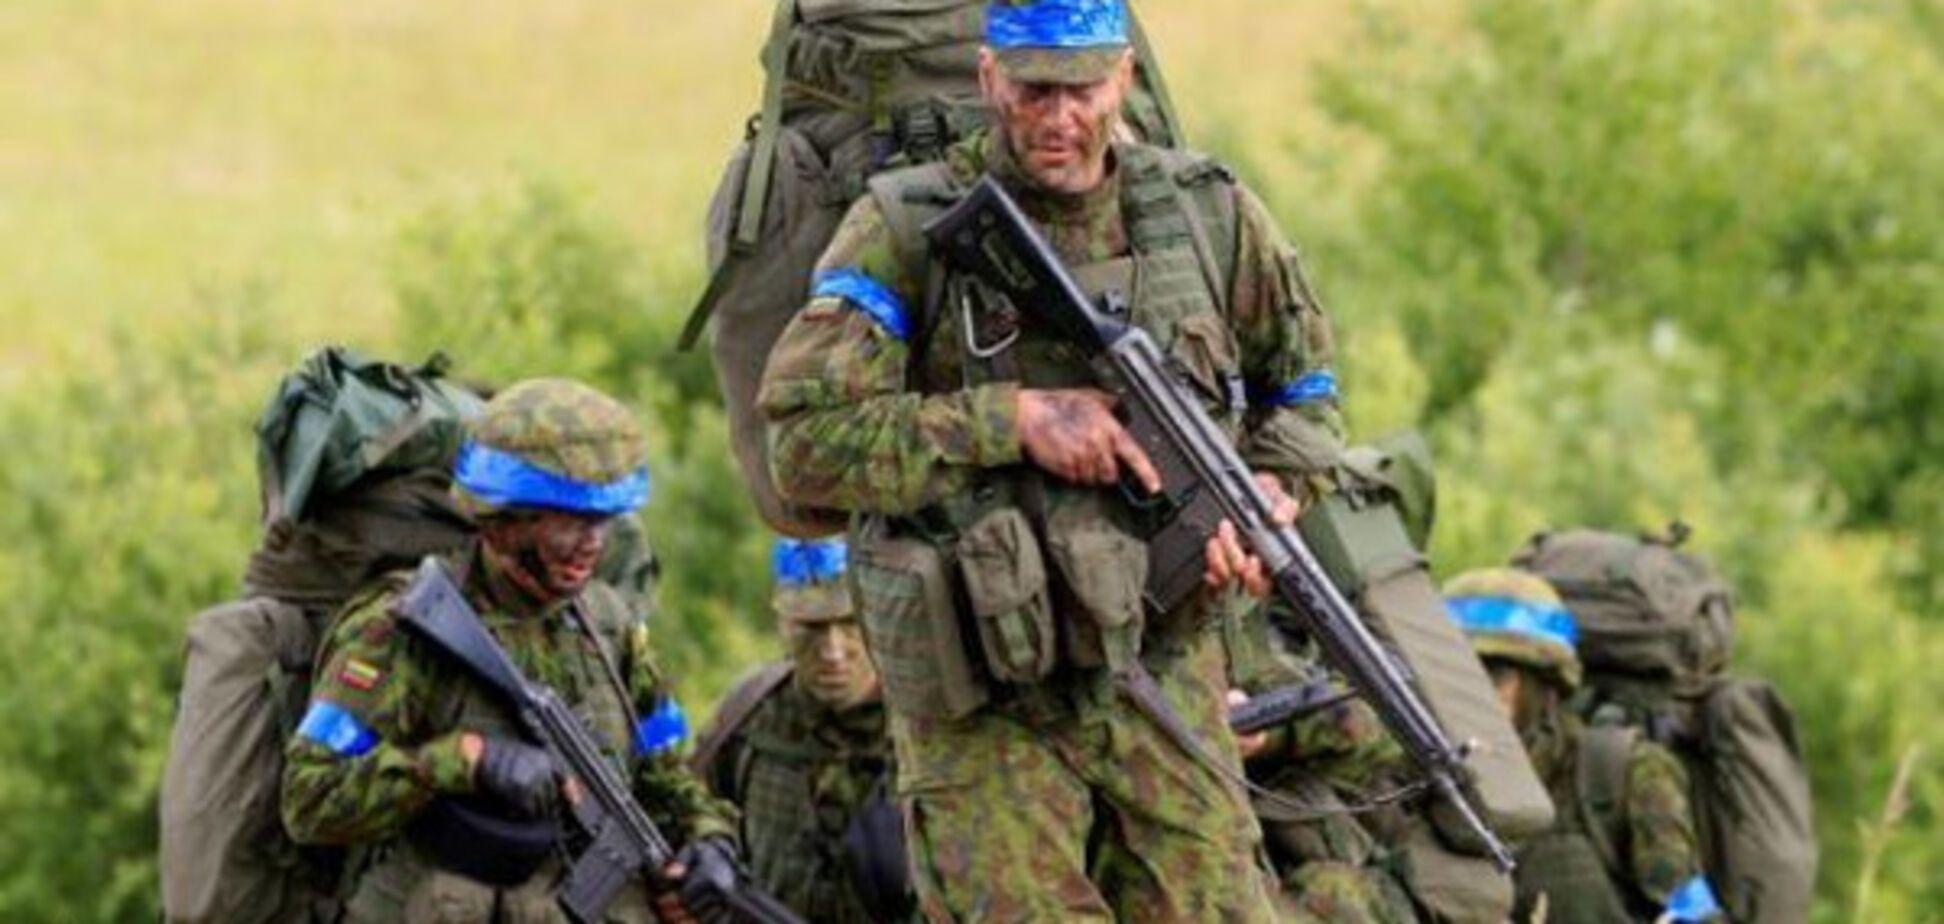 Прибалтика к нападению России готова